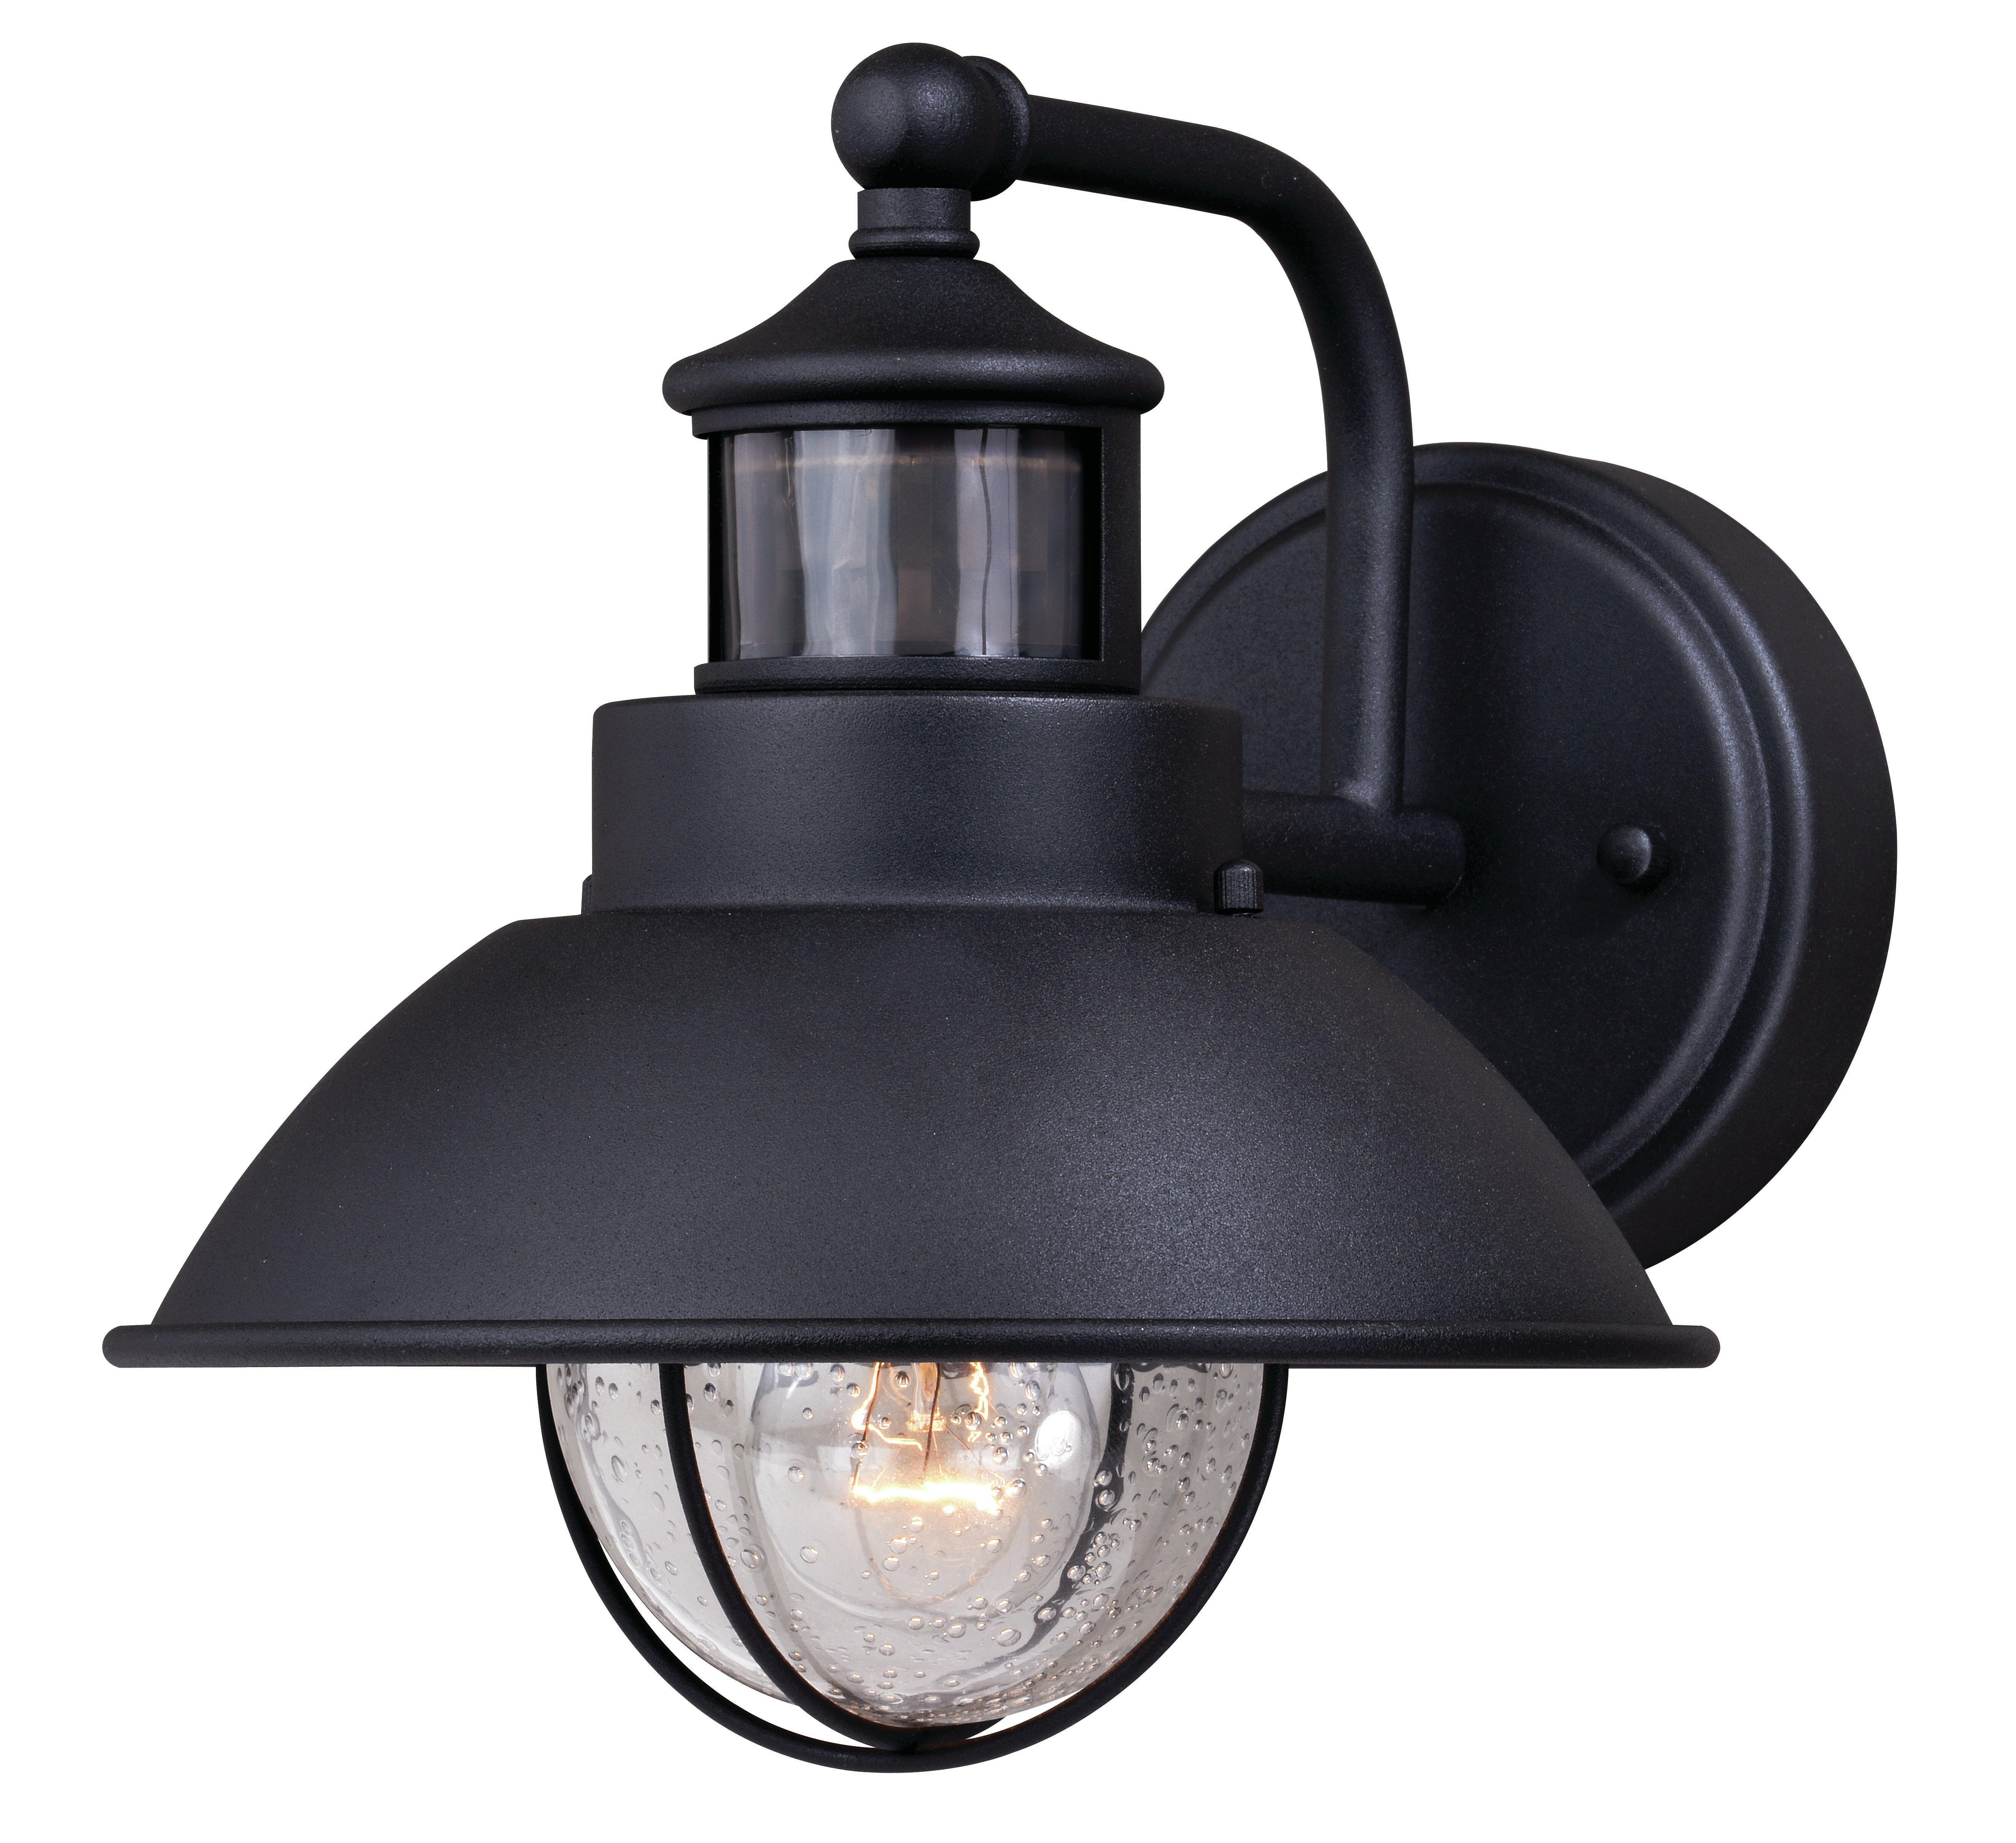 Archibald Dualux Outdoor Barn Light